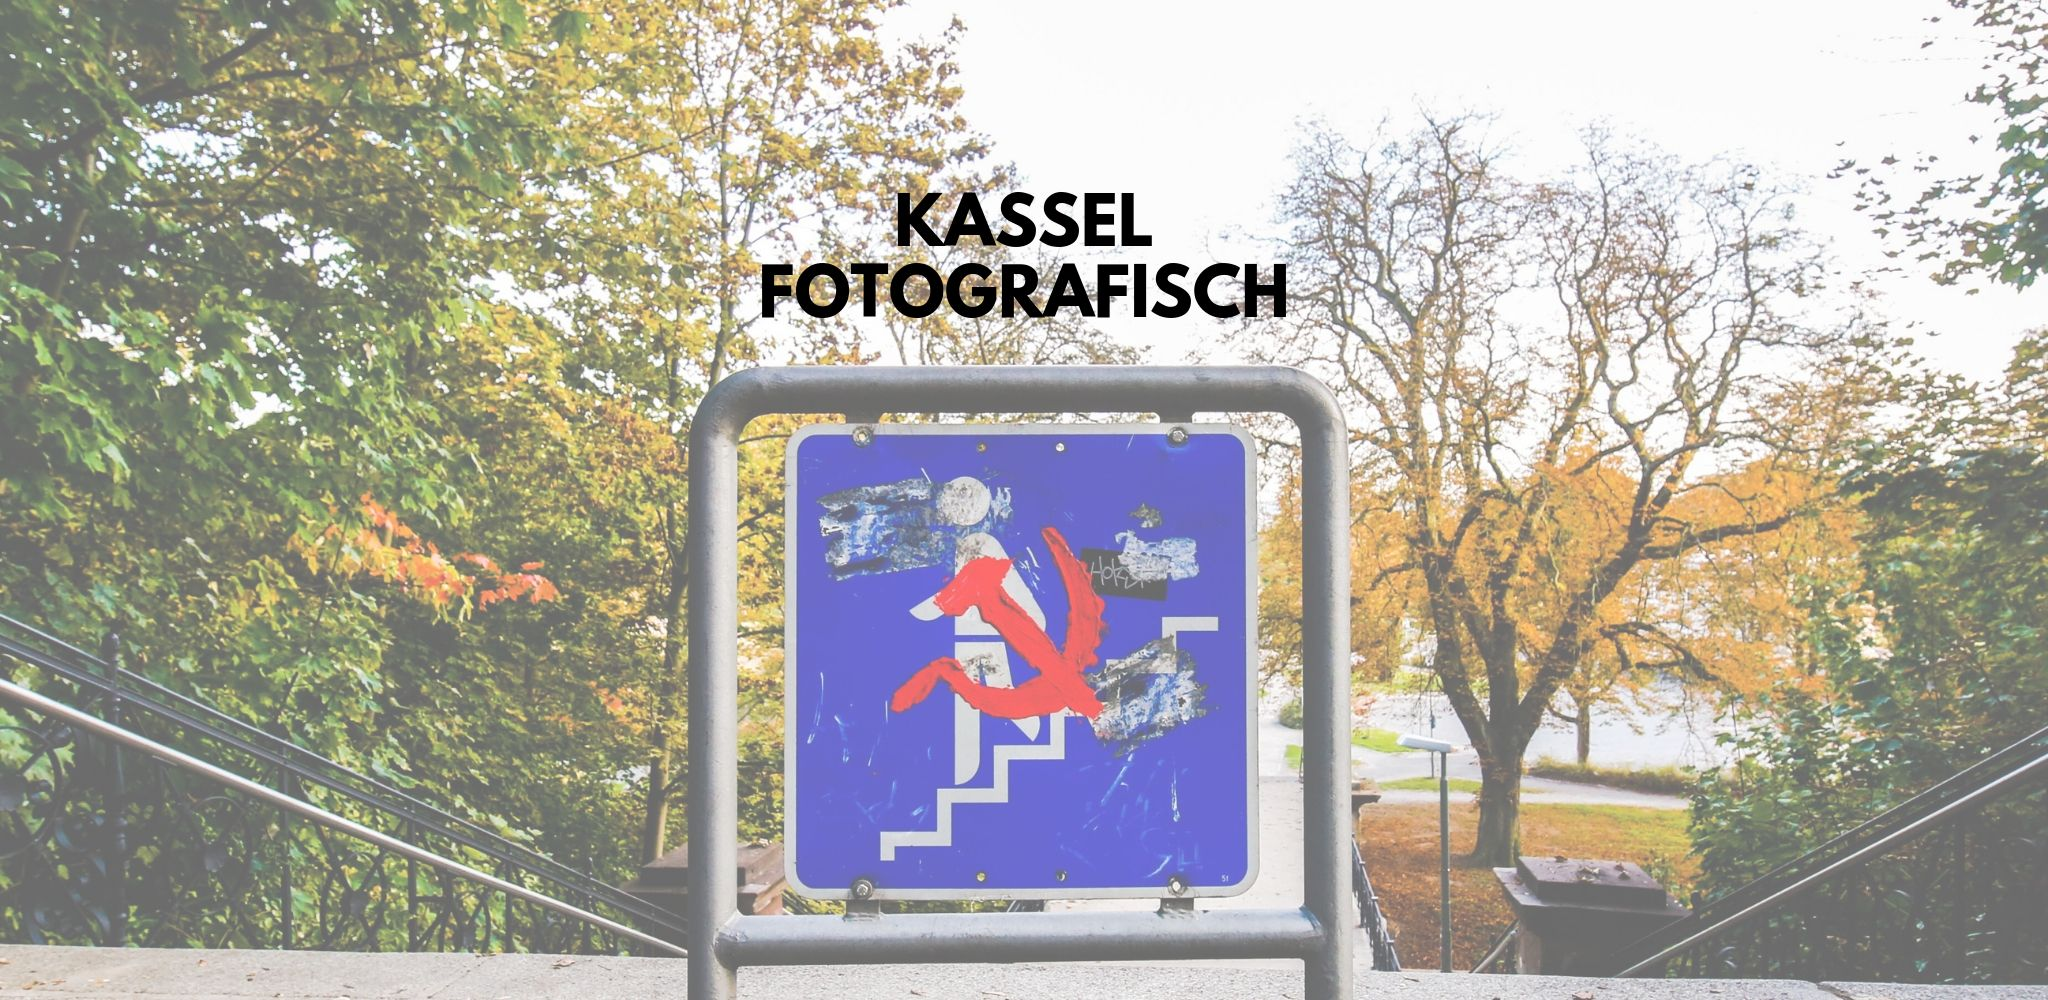 Kassel fotografisch